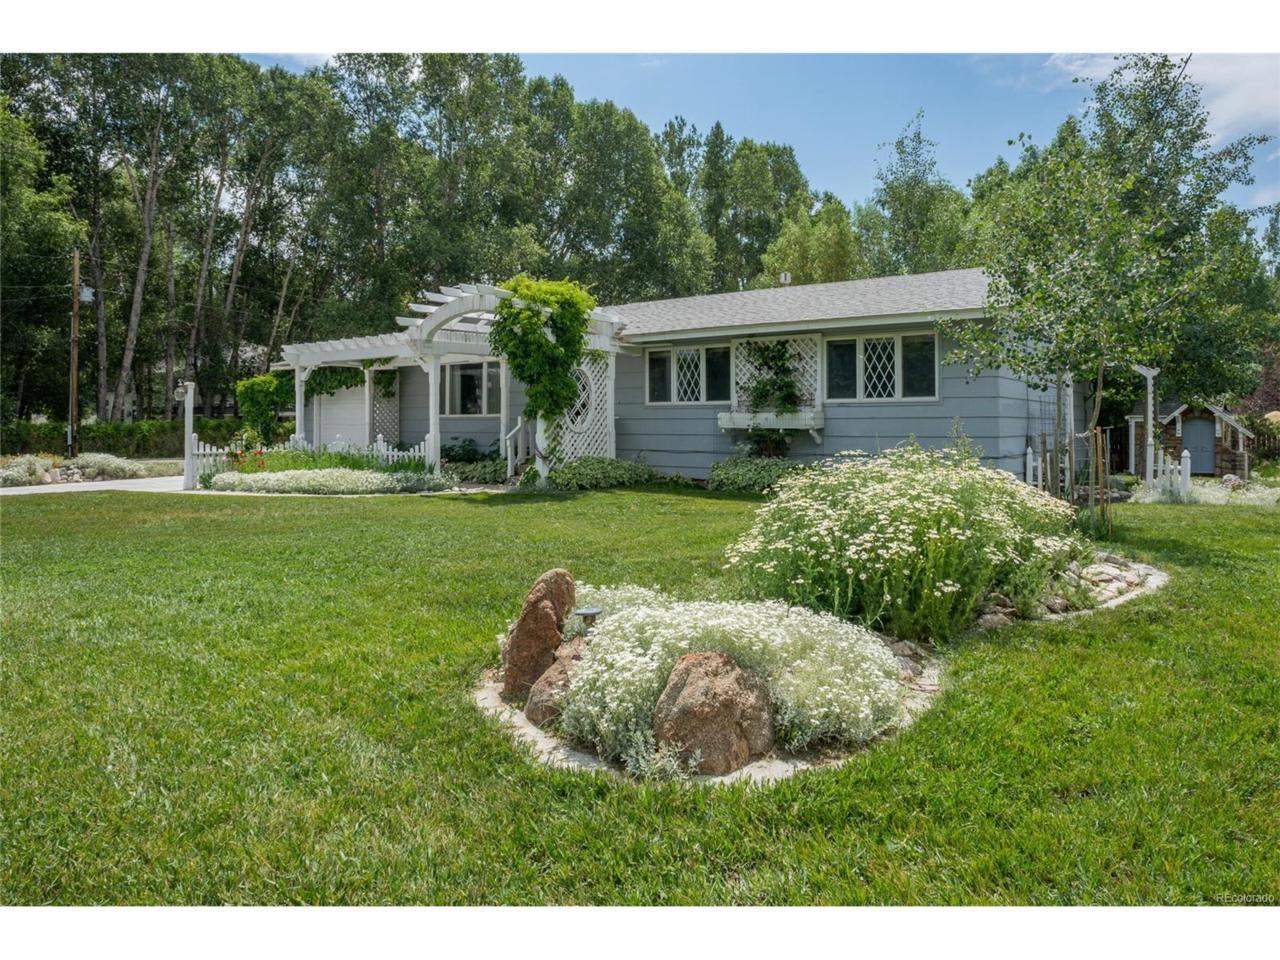 811 W Main Street, Buena Vista, CO 81211 (MLS #7862251) :: 8z Real Estate